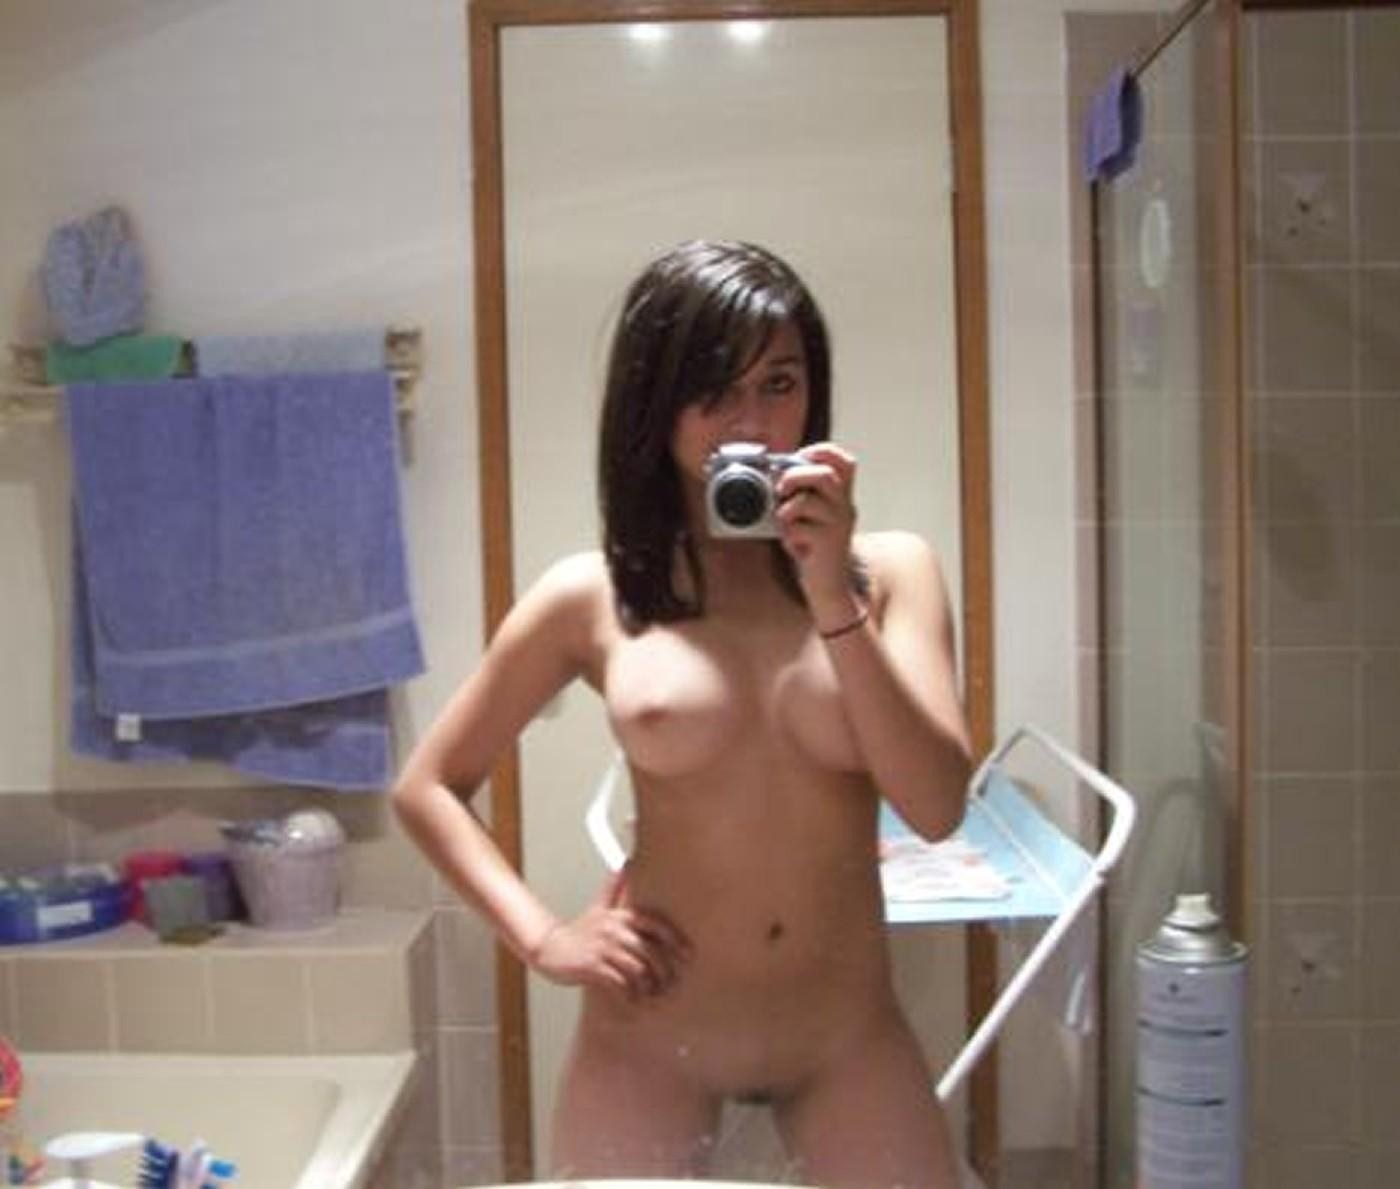 http://3.bp.blogspot.com/_Bmyua5Tp5gY/SWaZ124DDiI/AAAAAAAAAI0/kx7_ZH0IVQQ/s1600/123135706080411.jpg